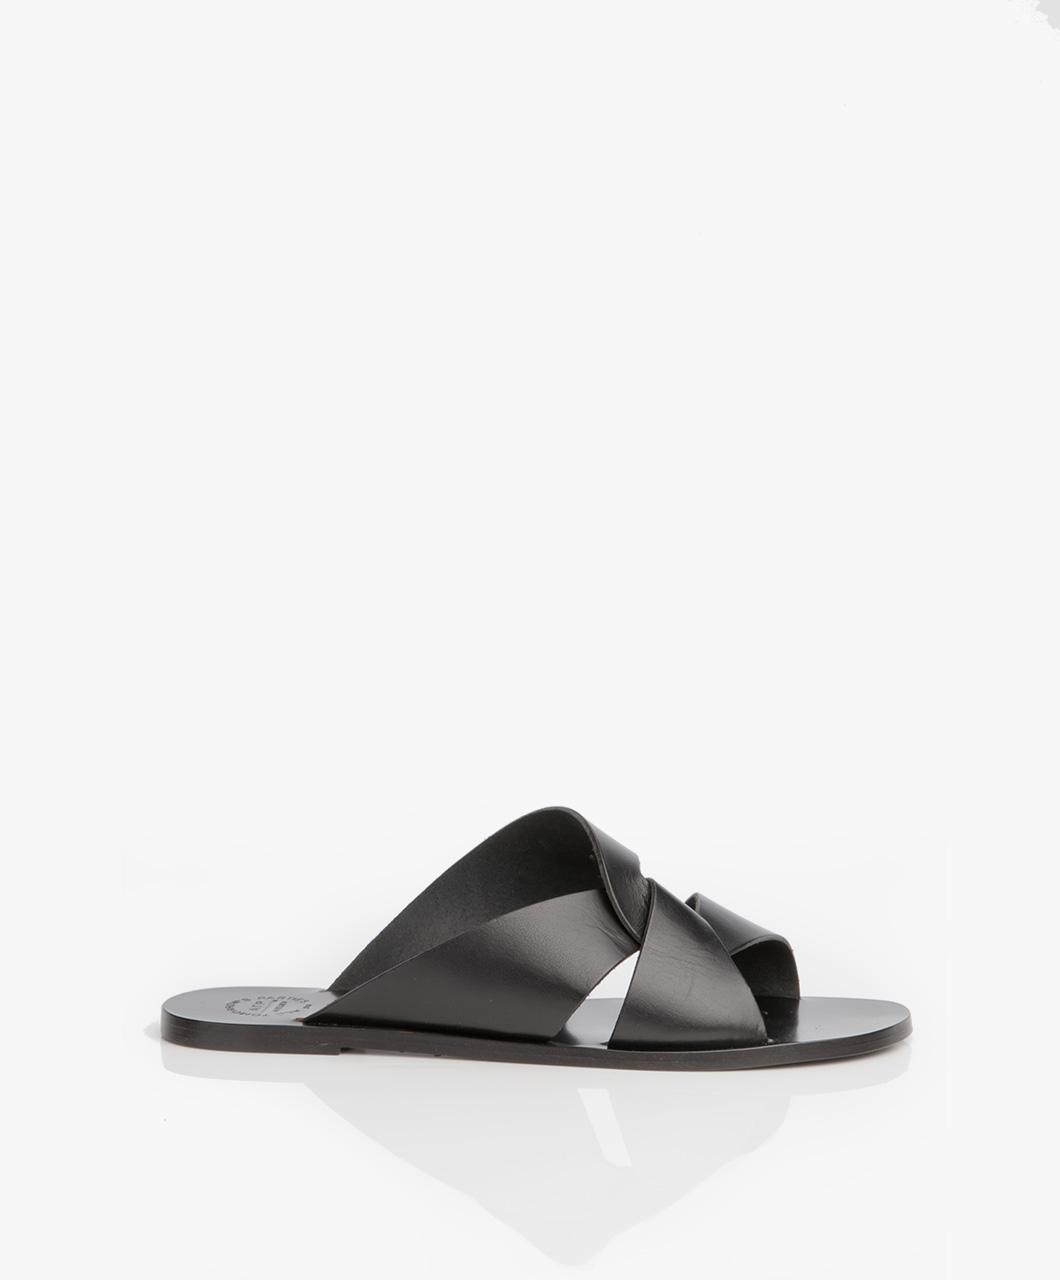 Immagine di ATP Atelier Slipper Sandals Allai in Black Leather